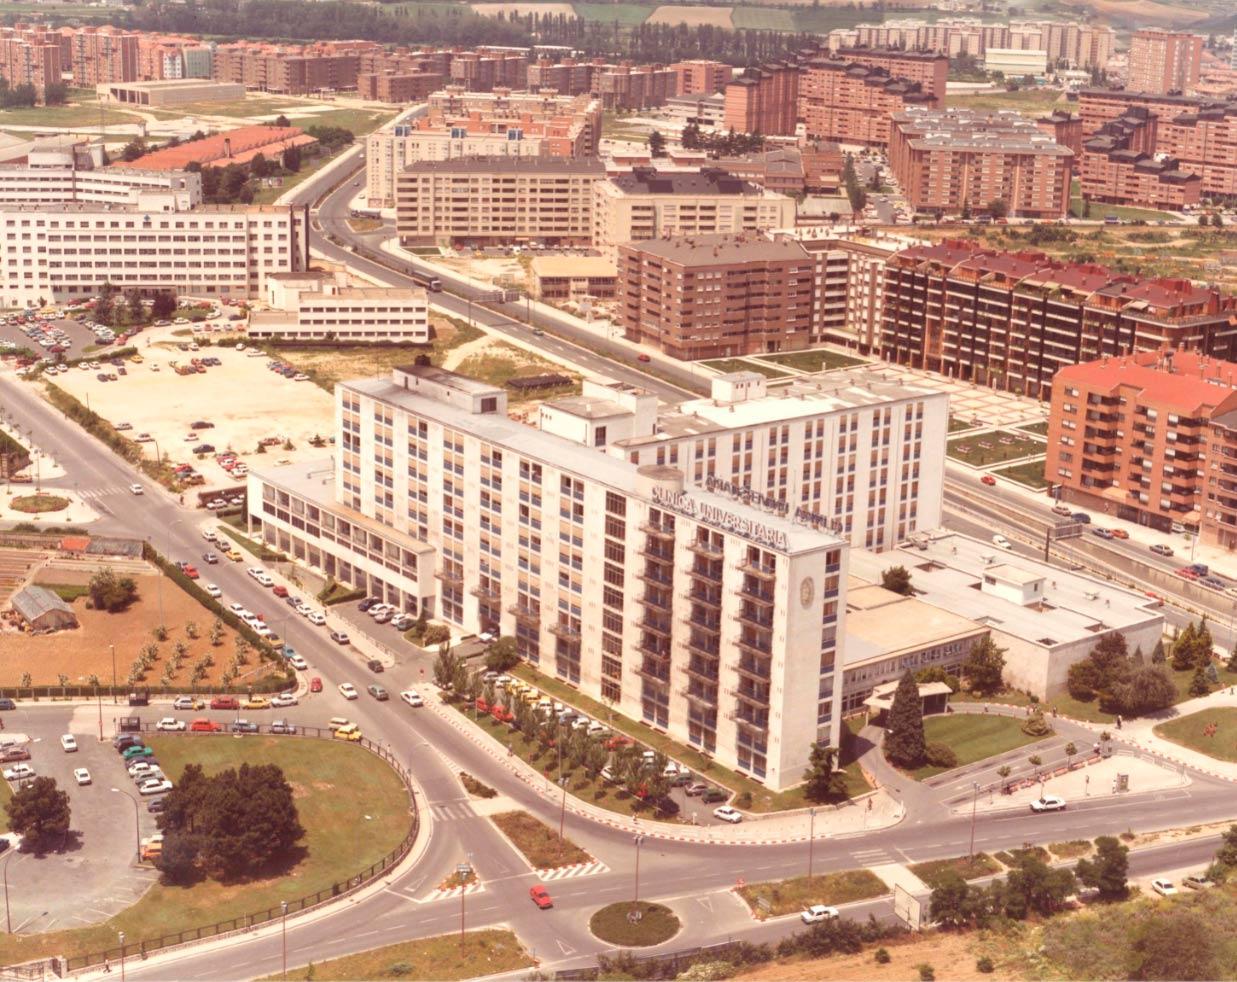 (1984) Vista aérea de la Clínica Universidad de Navarra.